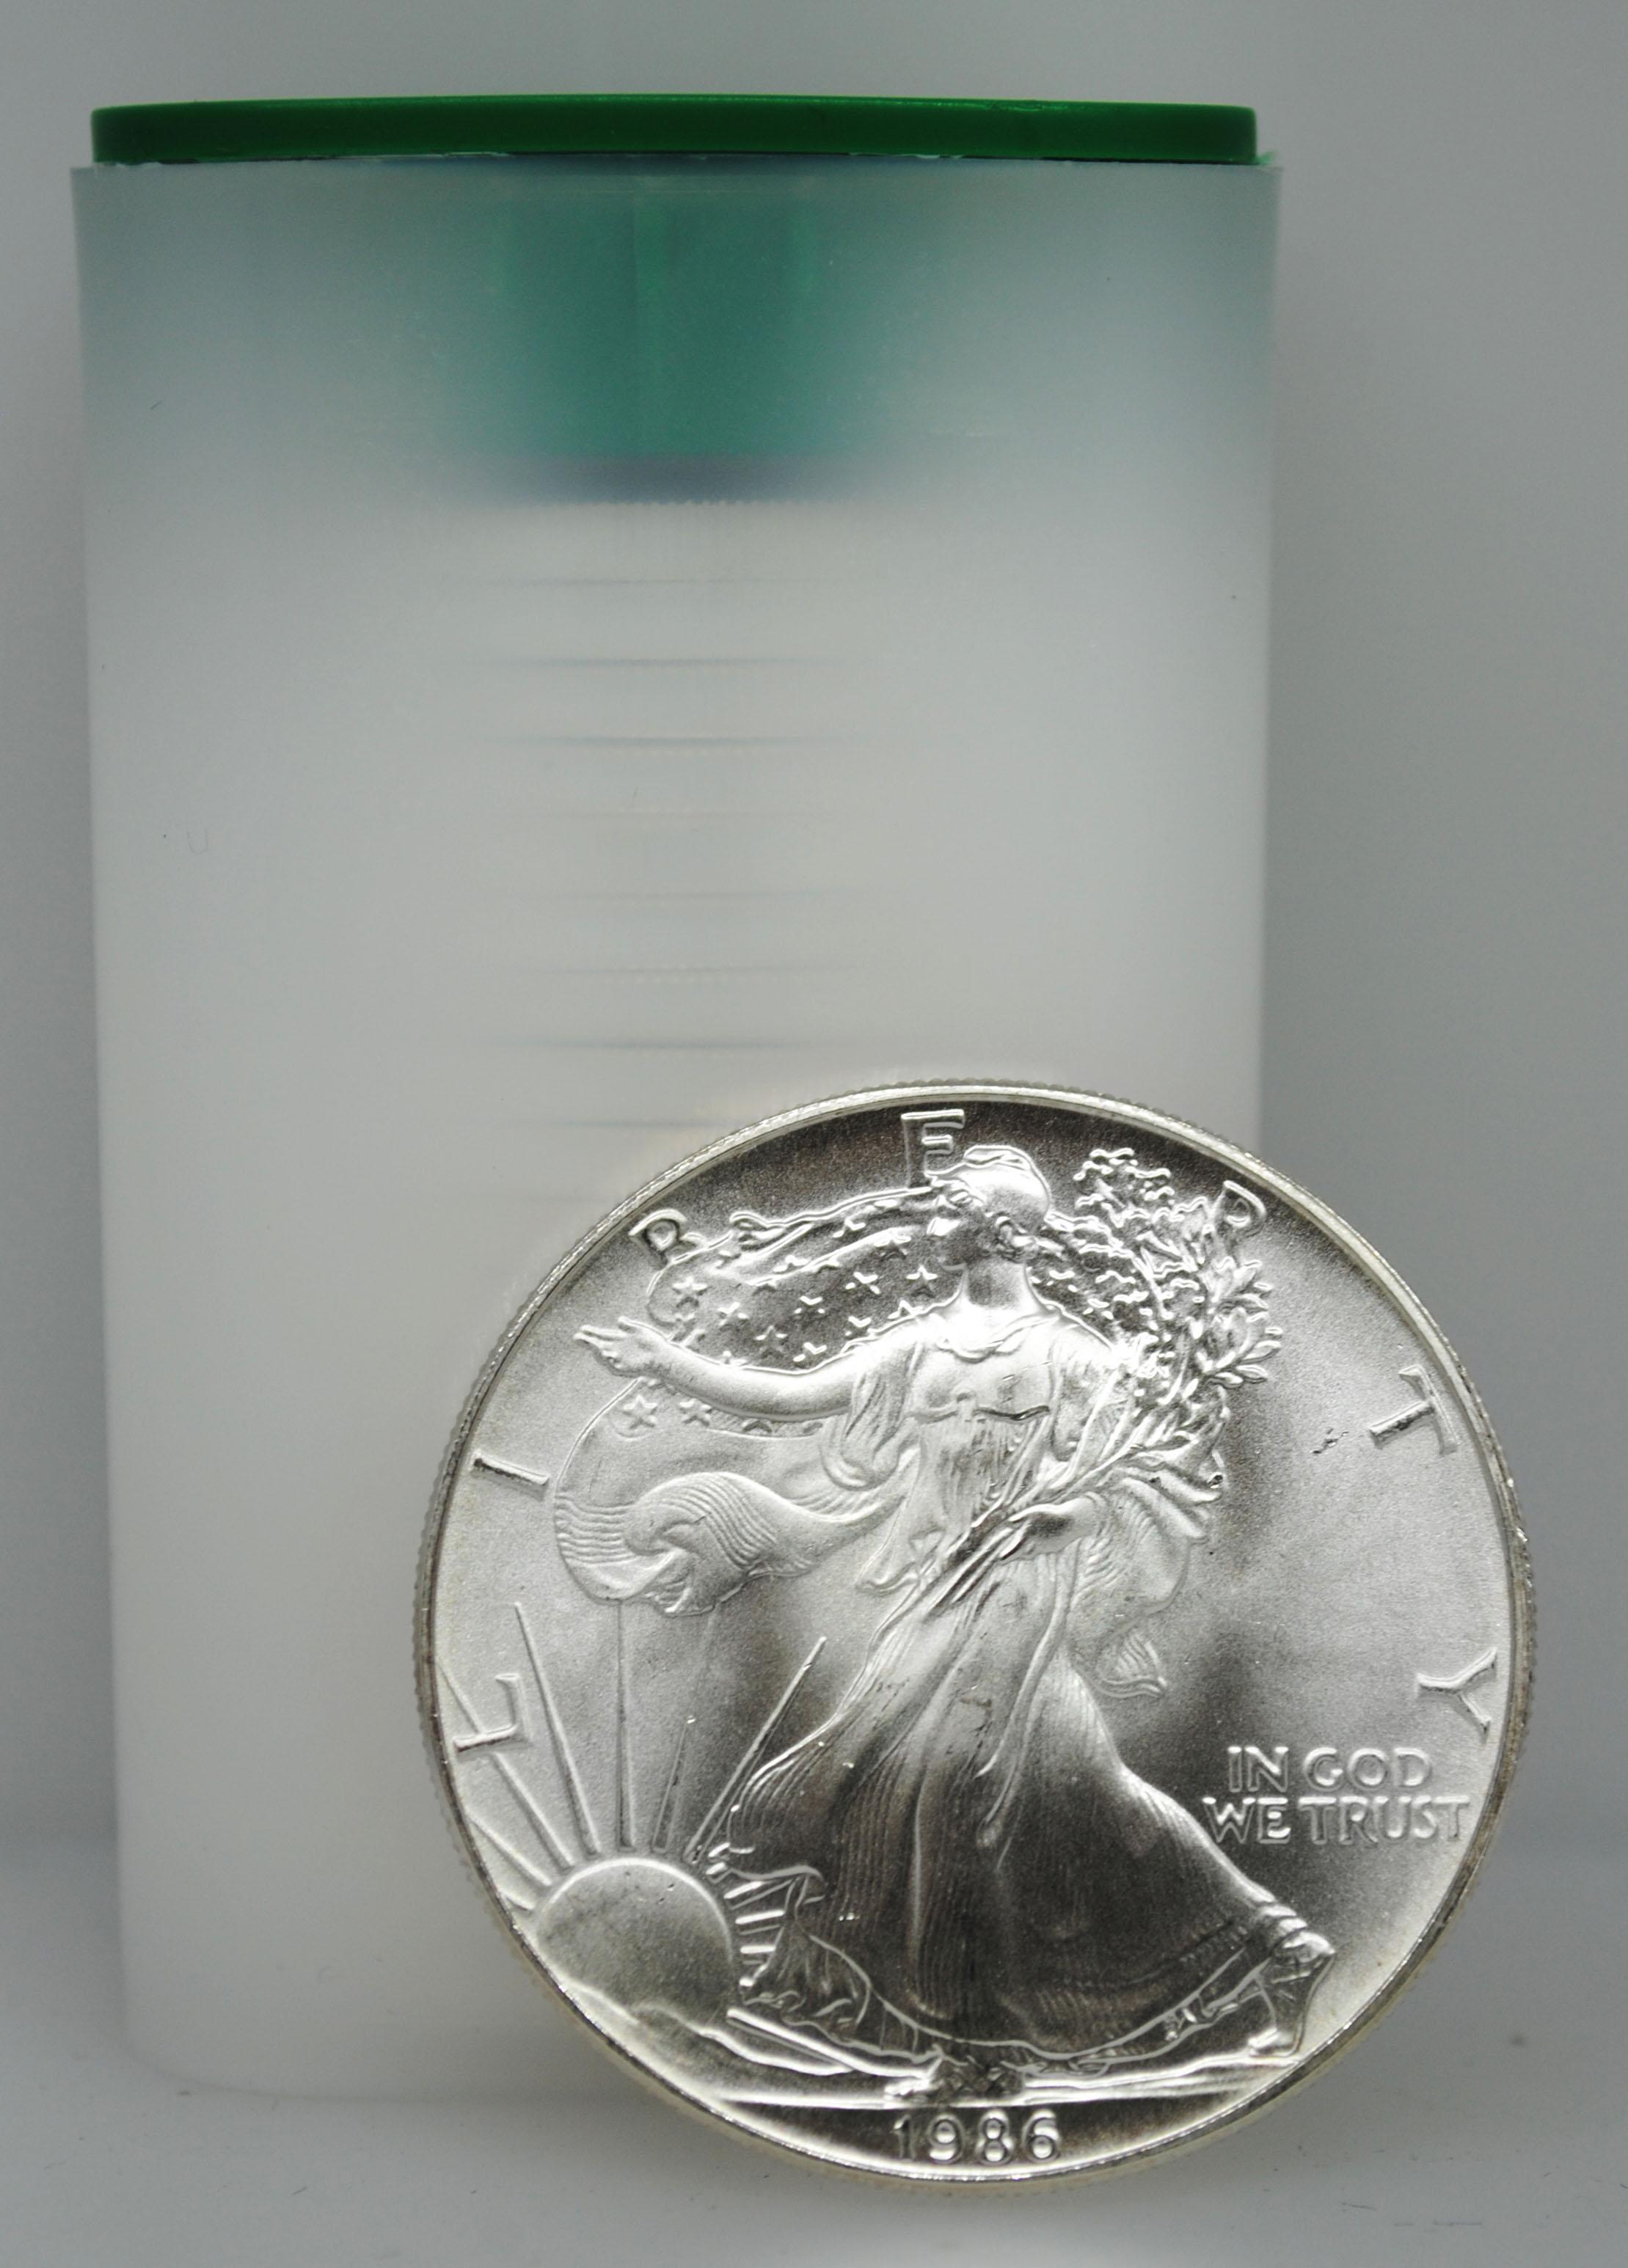 1986 Uncirculated Silver Eagle